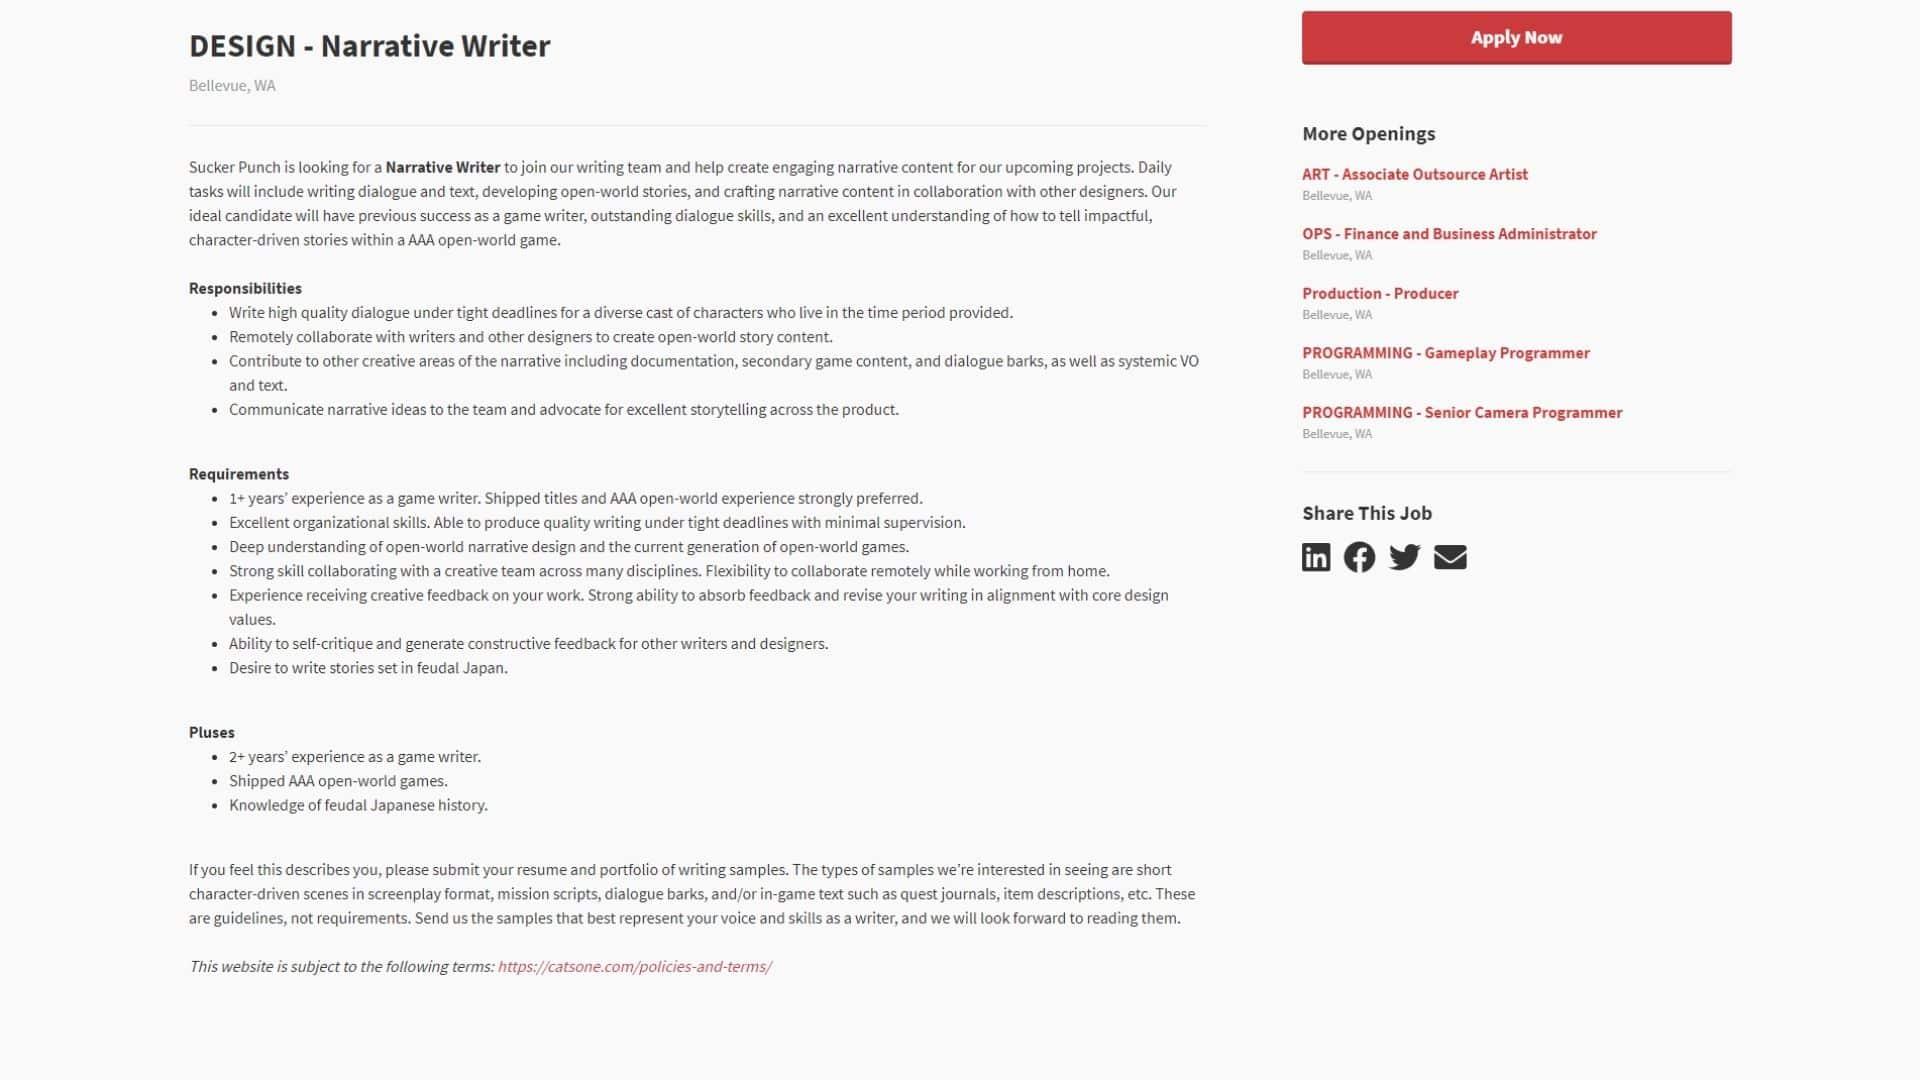 Job listing for Sucker Punch Narrative Writer job